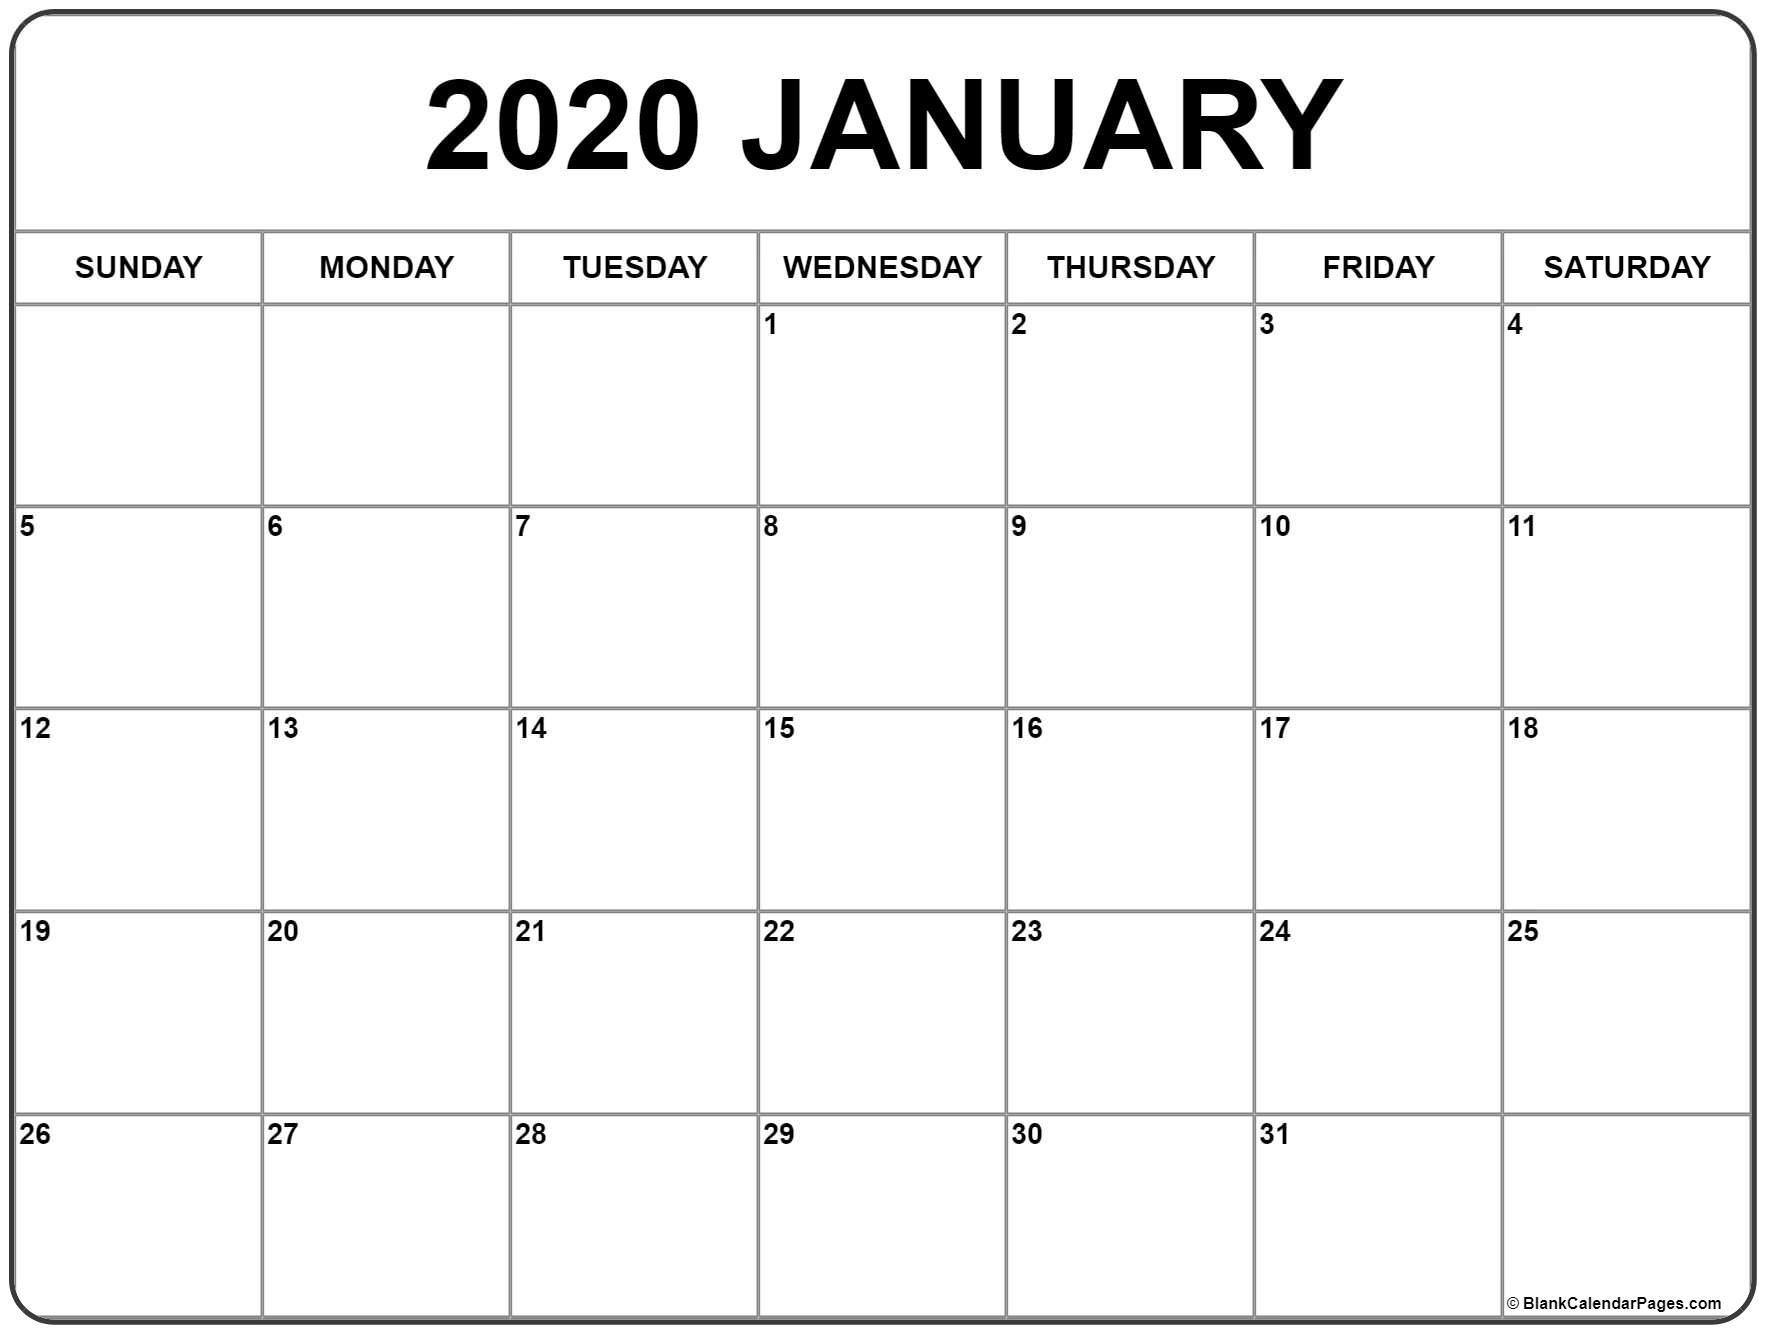 Full calendar print view in 2020 monthly calendar